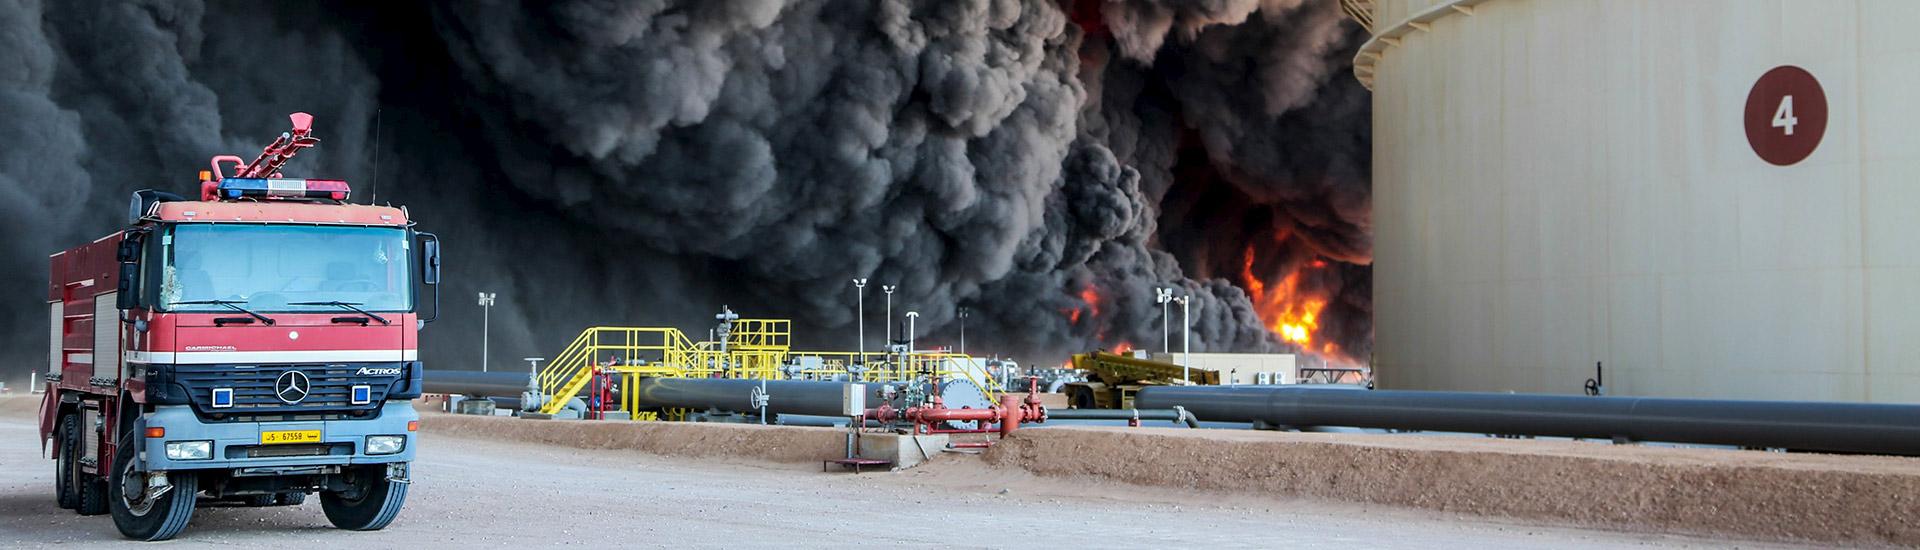 pipeline-sabotage-oil-fossil-fuel-resistance